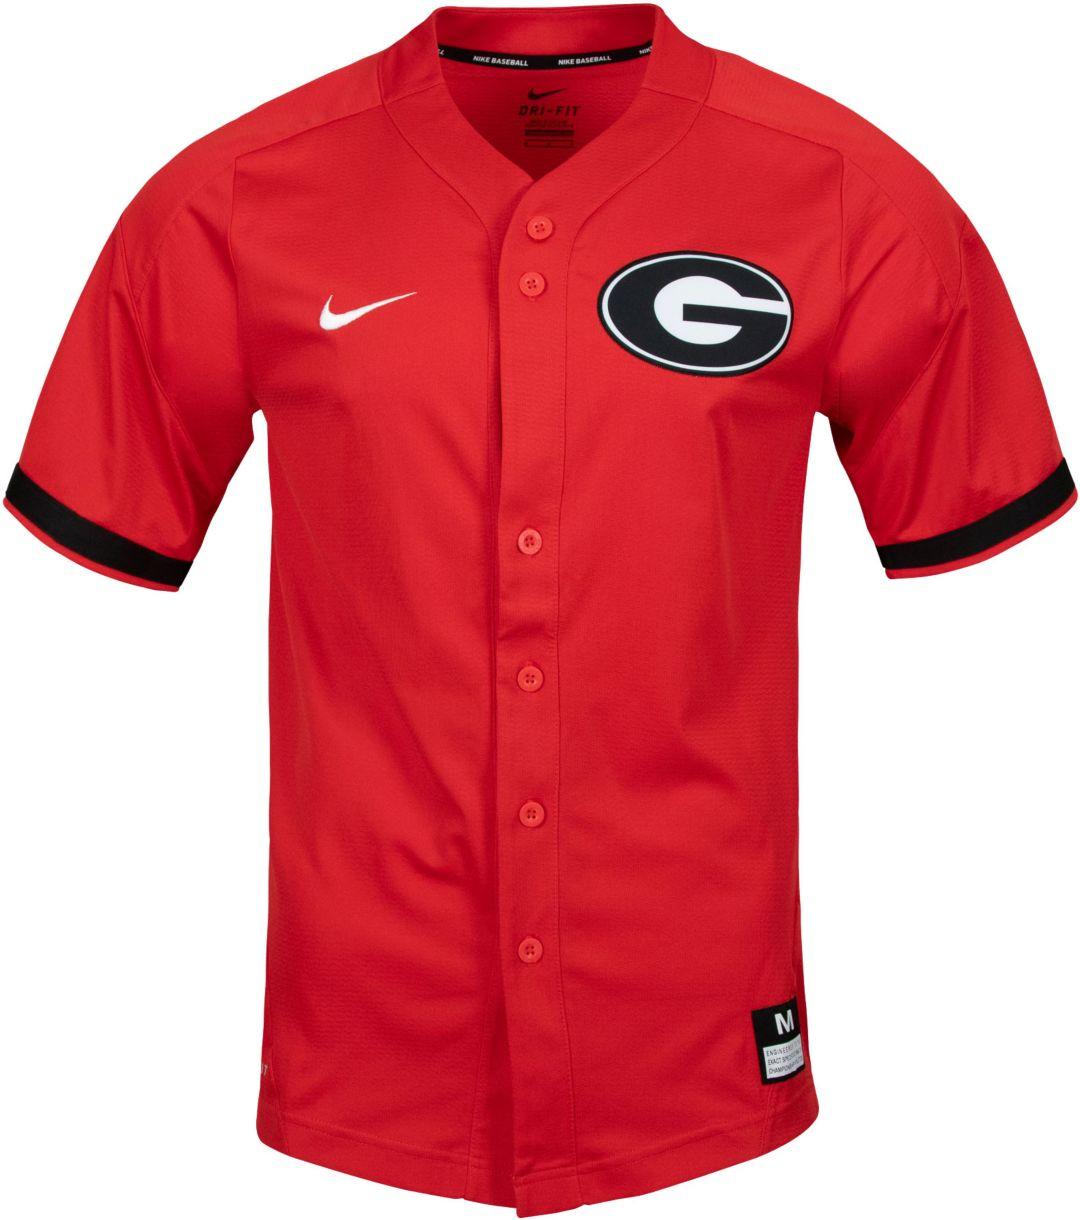 promo code 4428d 86356 Nike Men's Georgia Bulldogs Red Dri-FIT Replica Baseball Jersey